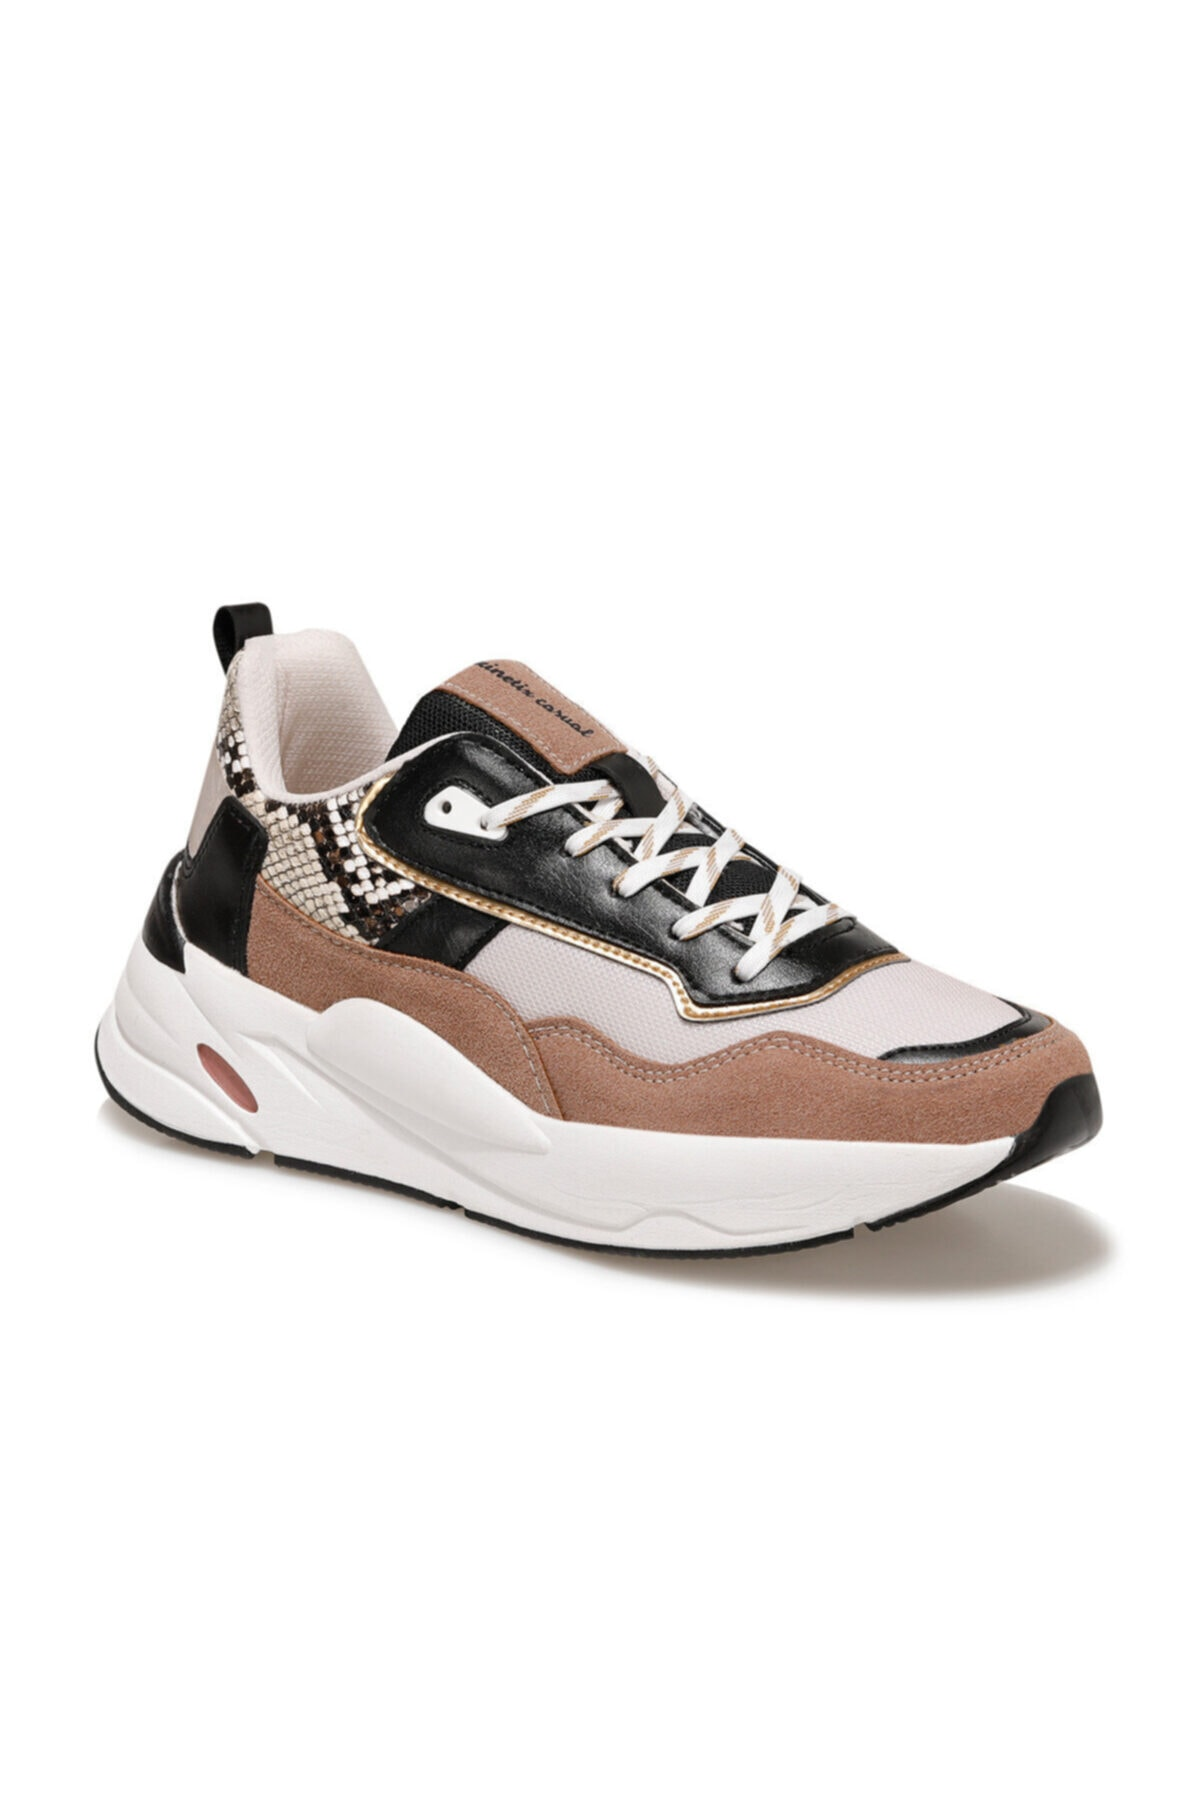 Kinetix BURGES Gül Kurusu Kadın Fashion Sneaker 100540699 1